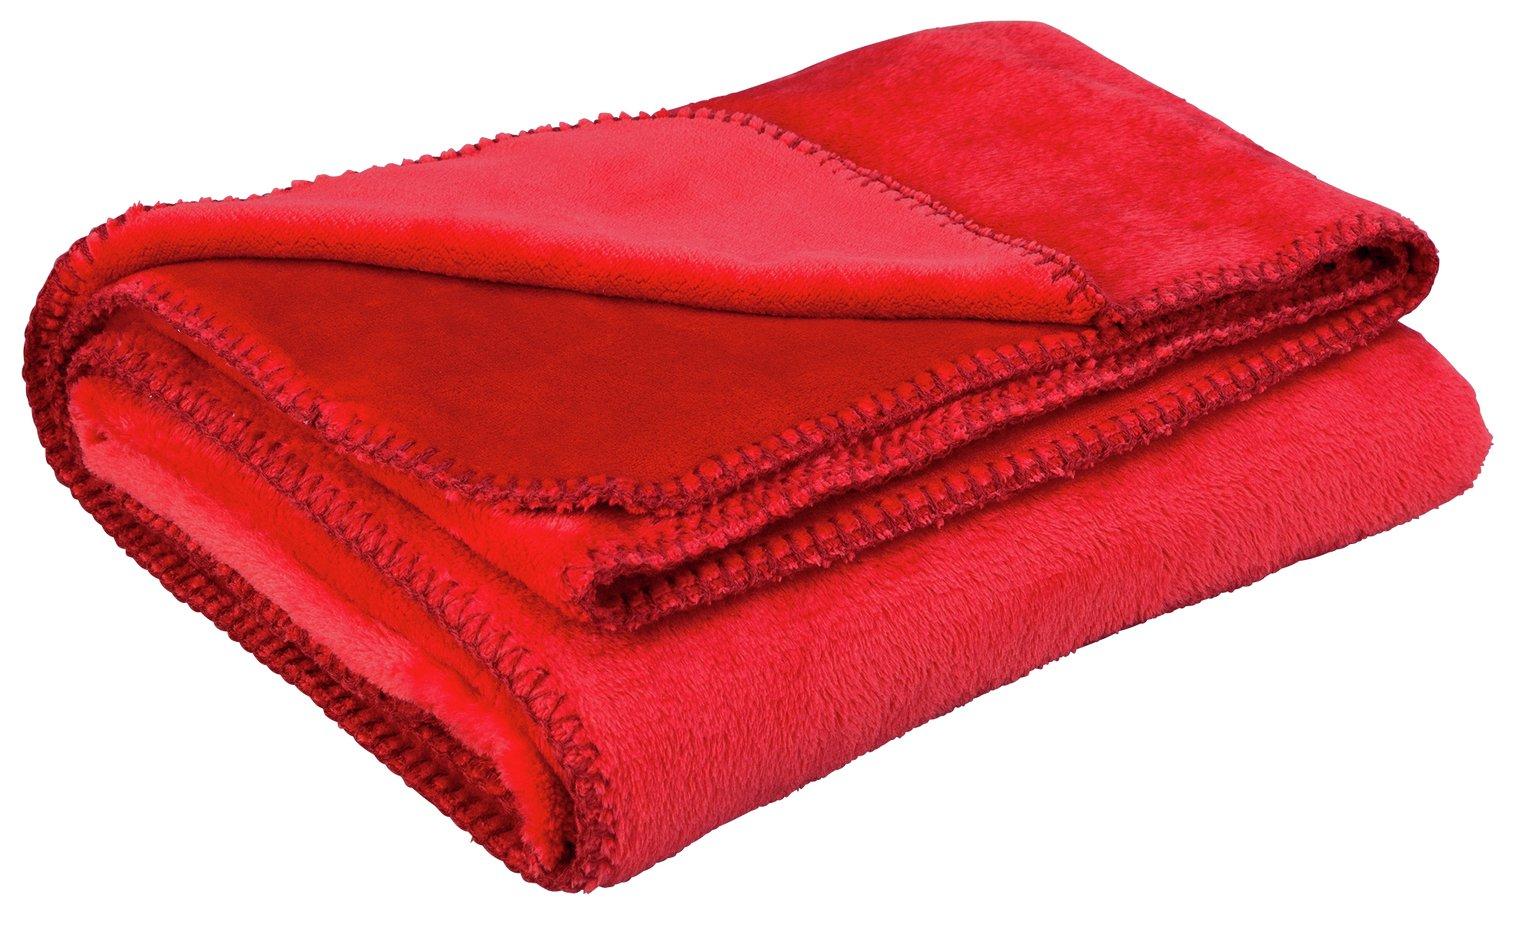 Argos Home Supersoft Throw - Poppy Red